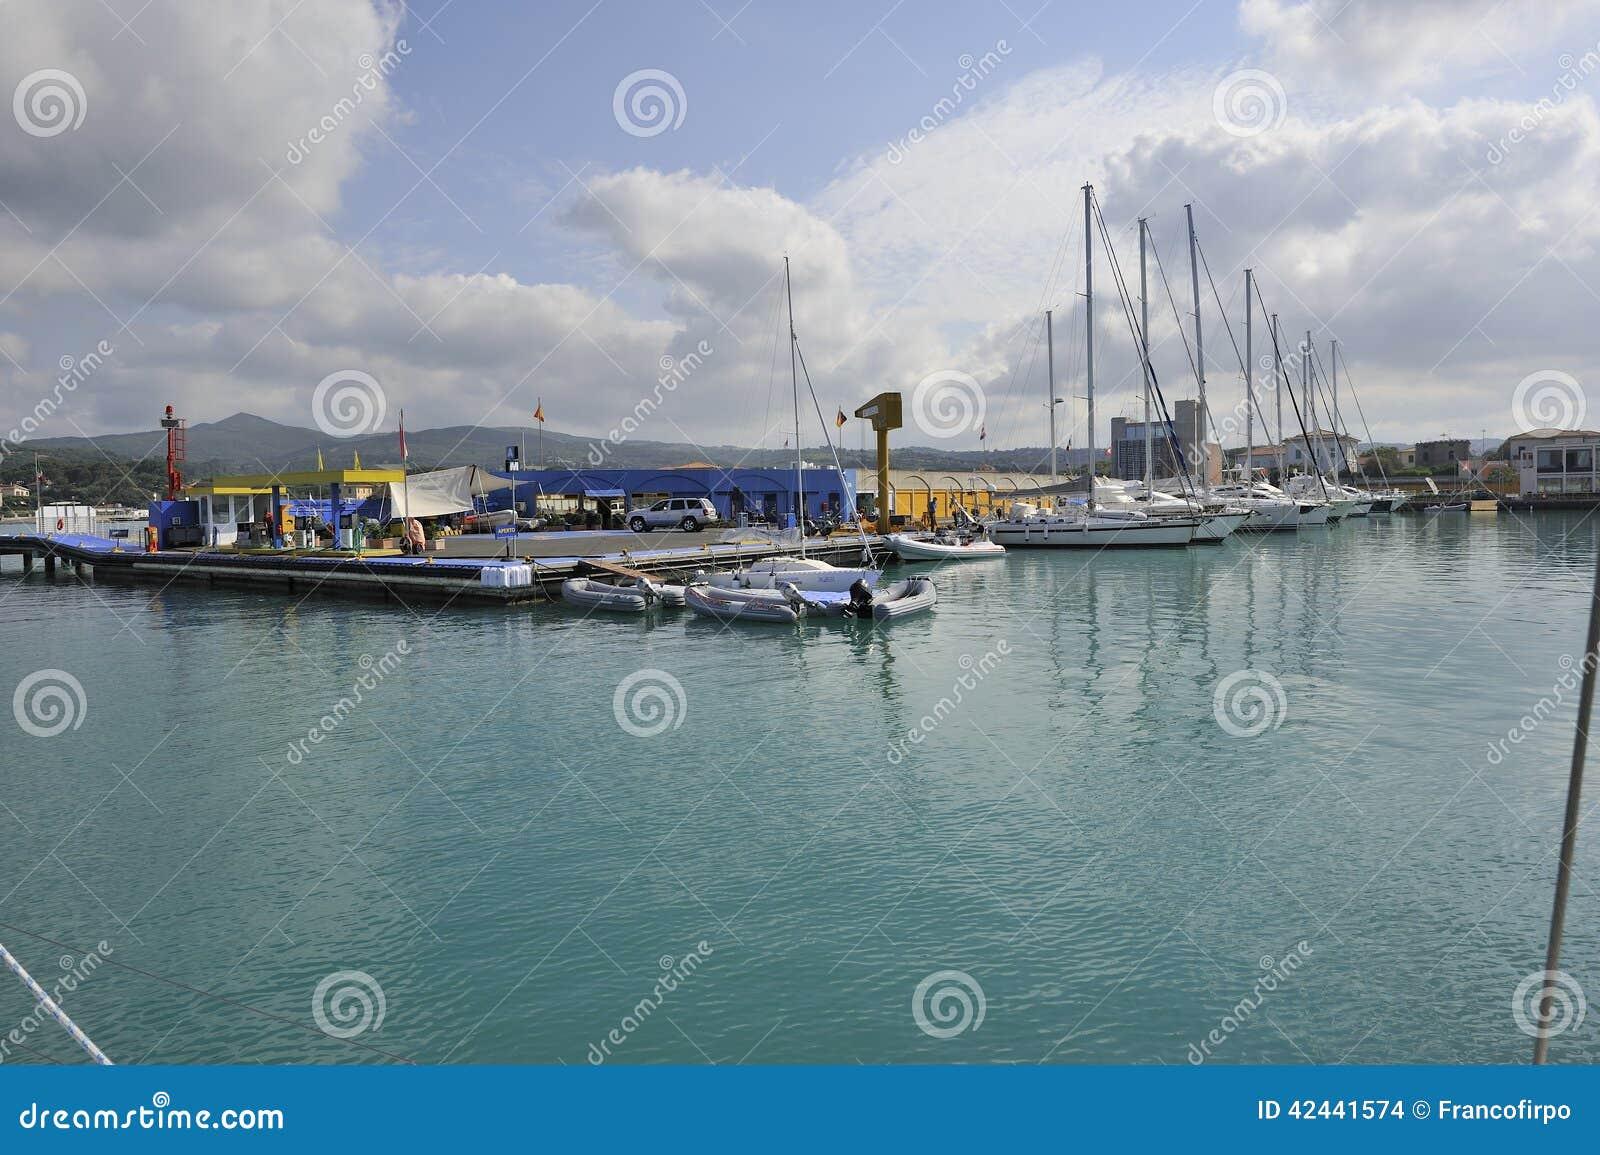 Puerto de Cala de medici